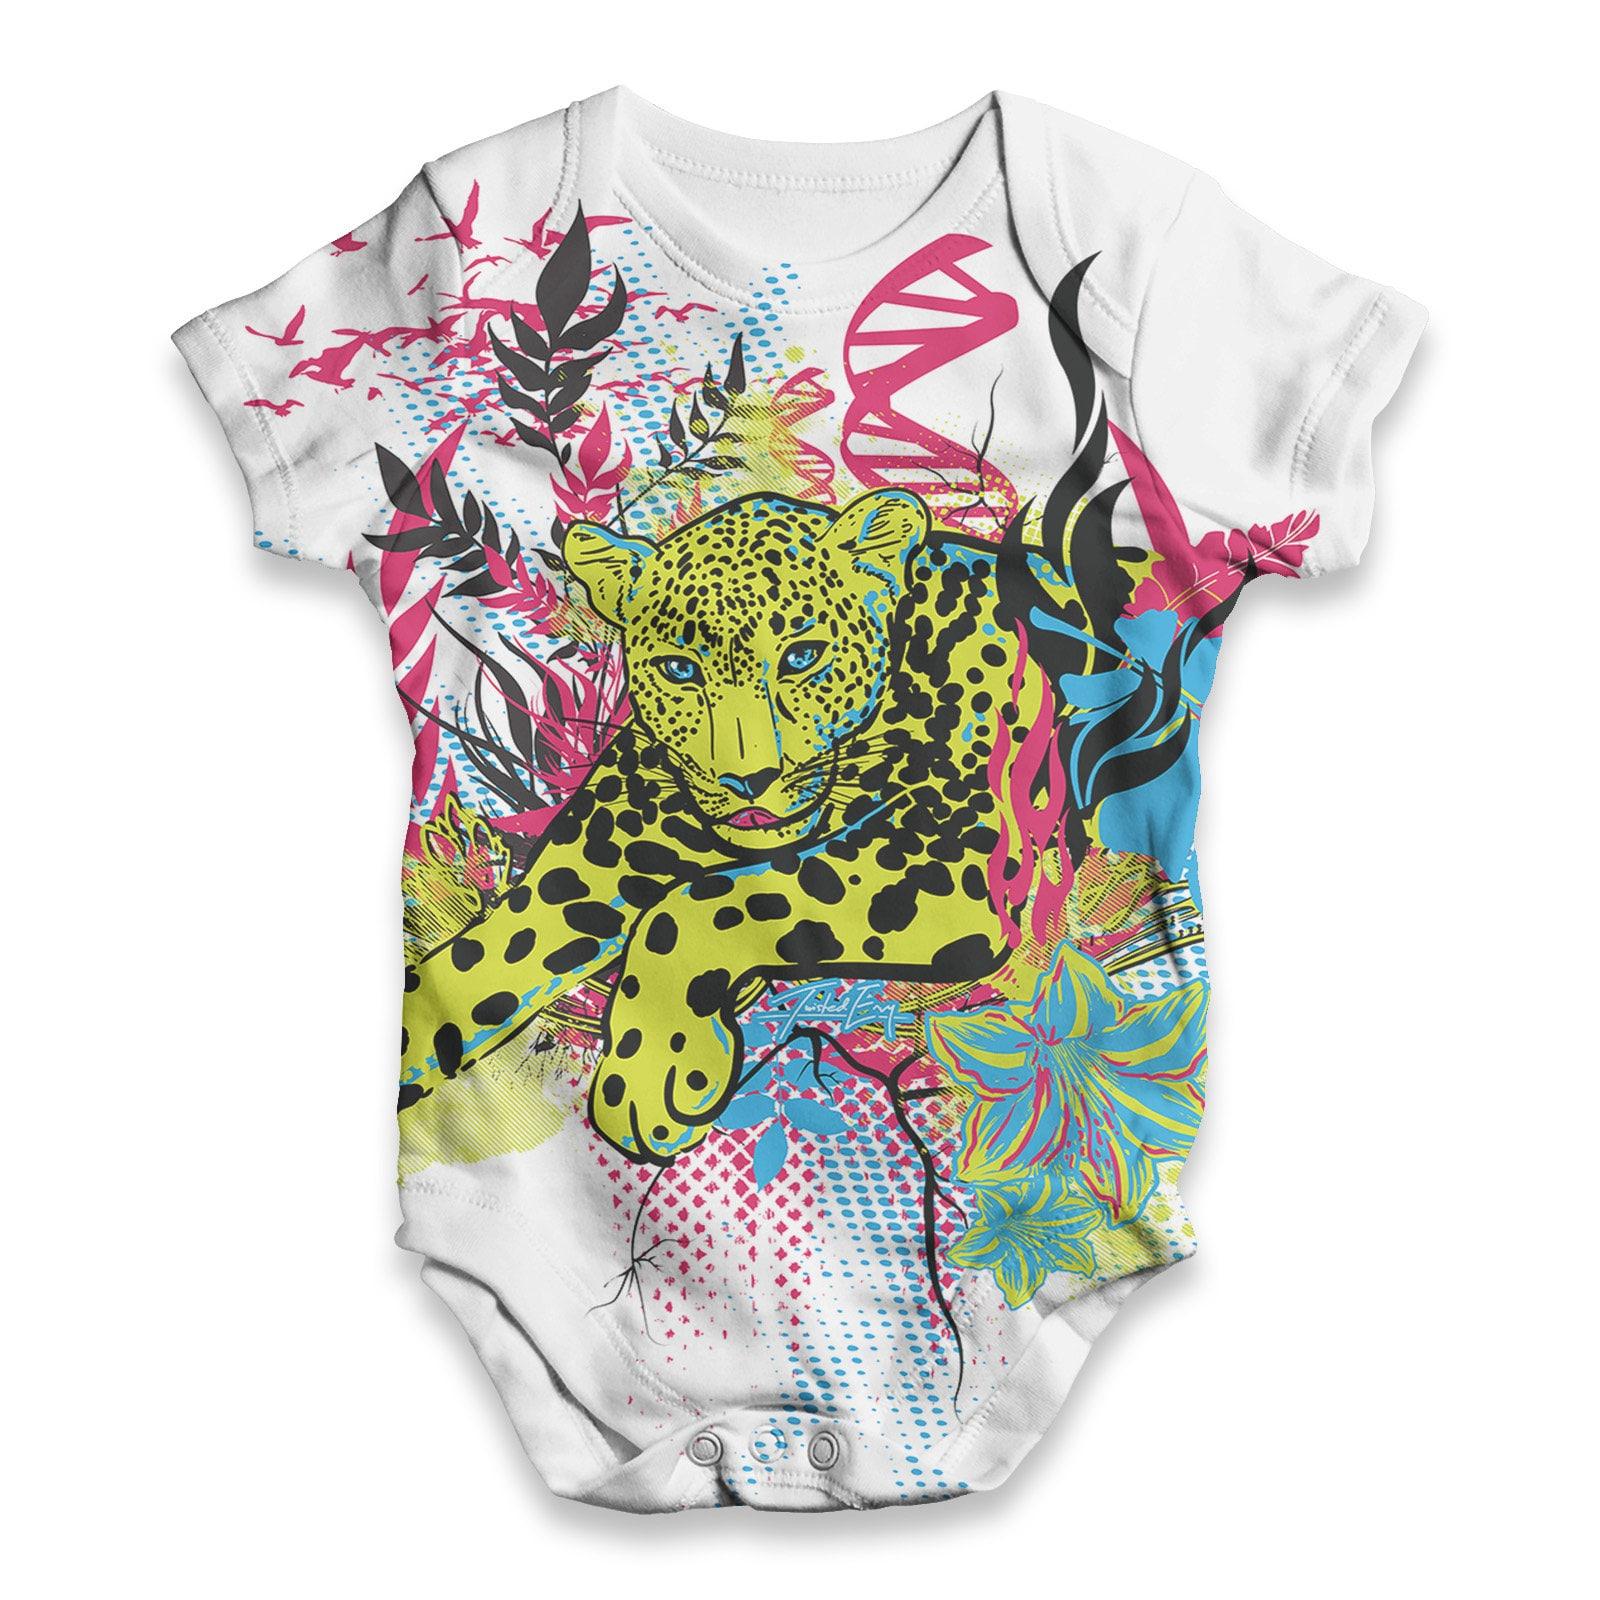 Baby Boys Clothing